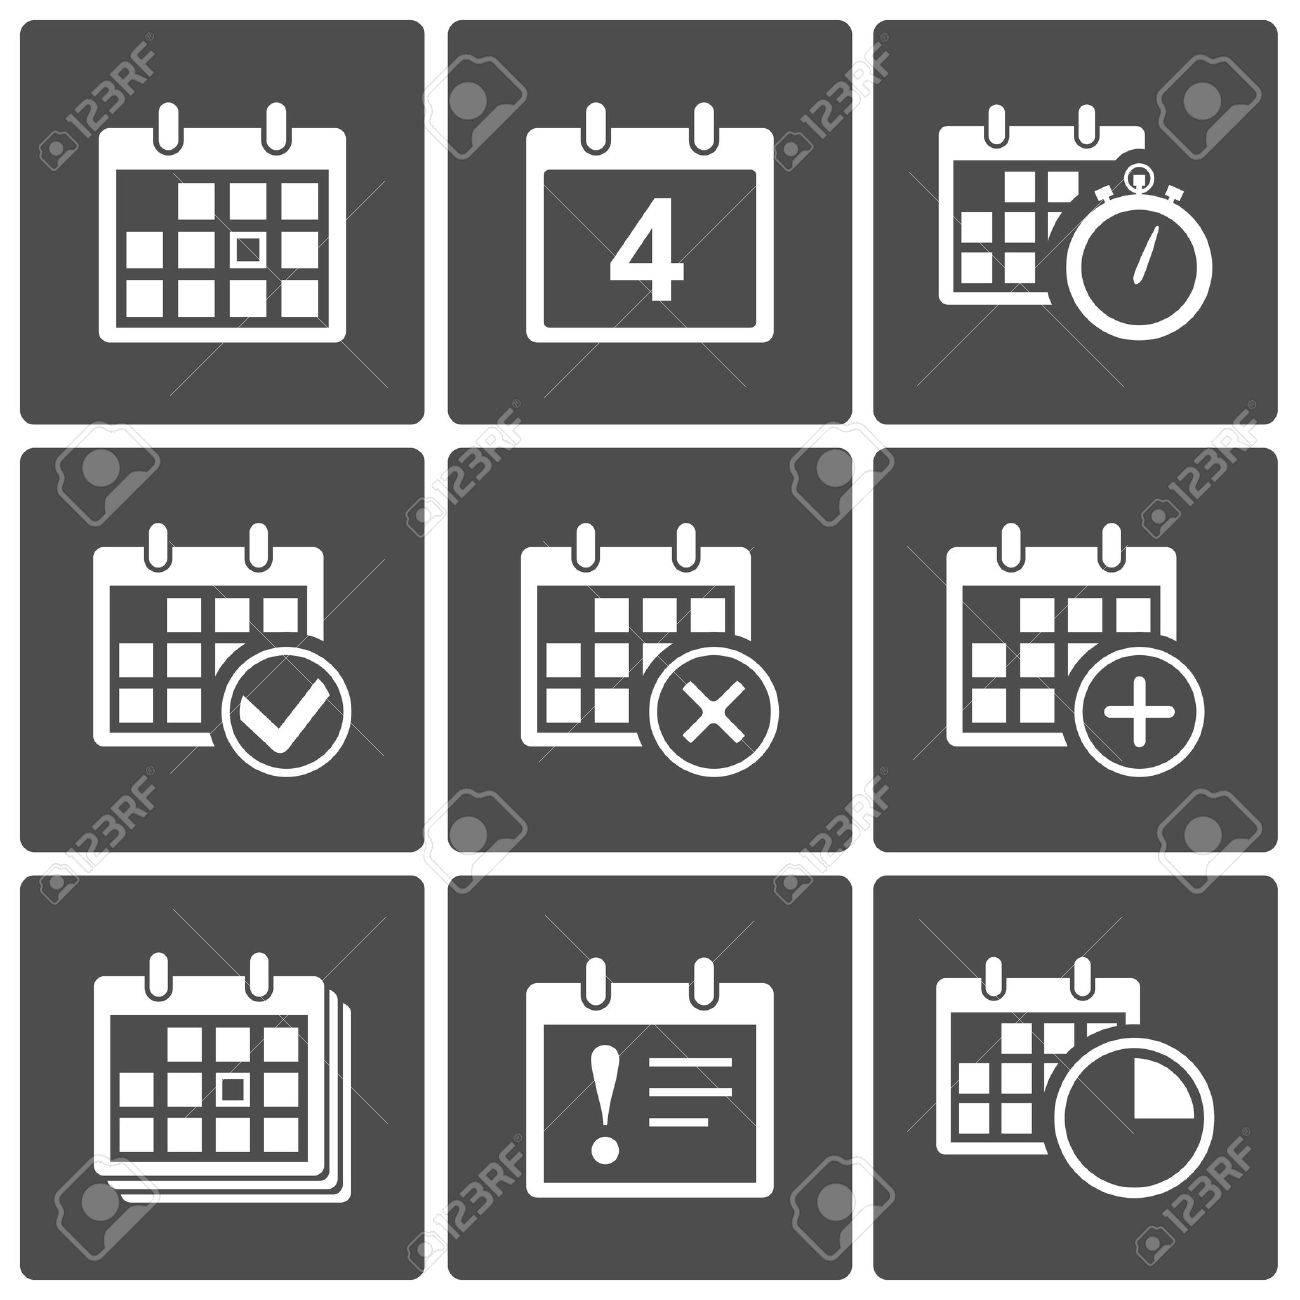 Vector Calendar Icons  event add delete progress Stock Vector - 17905519